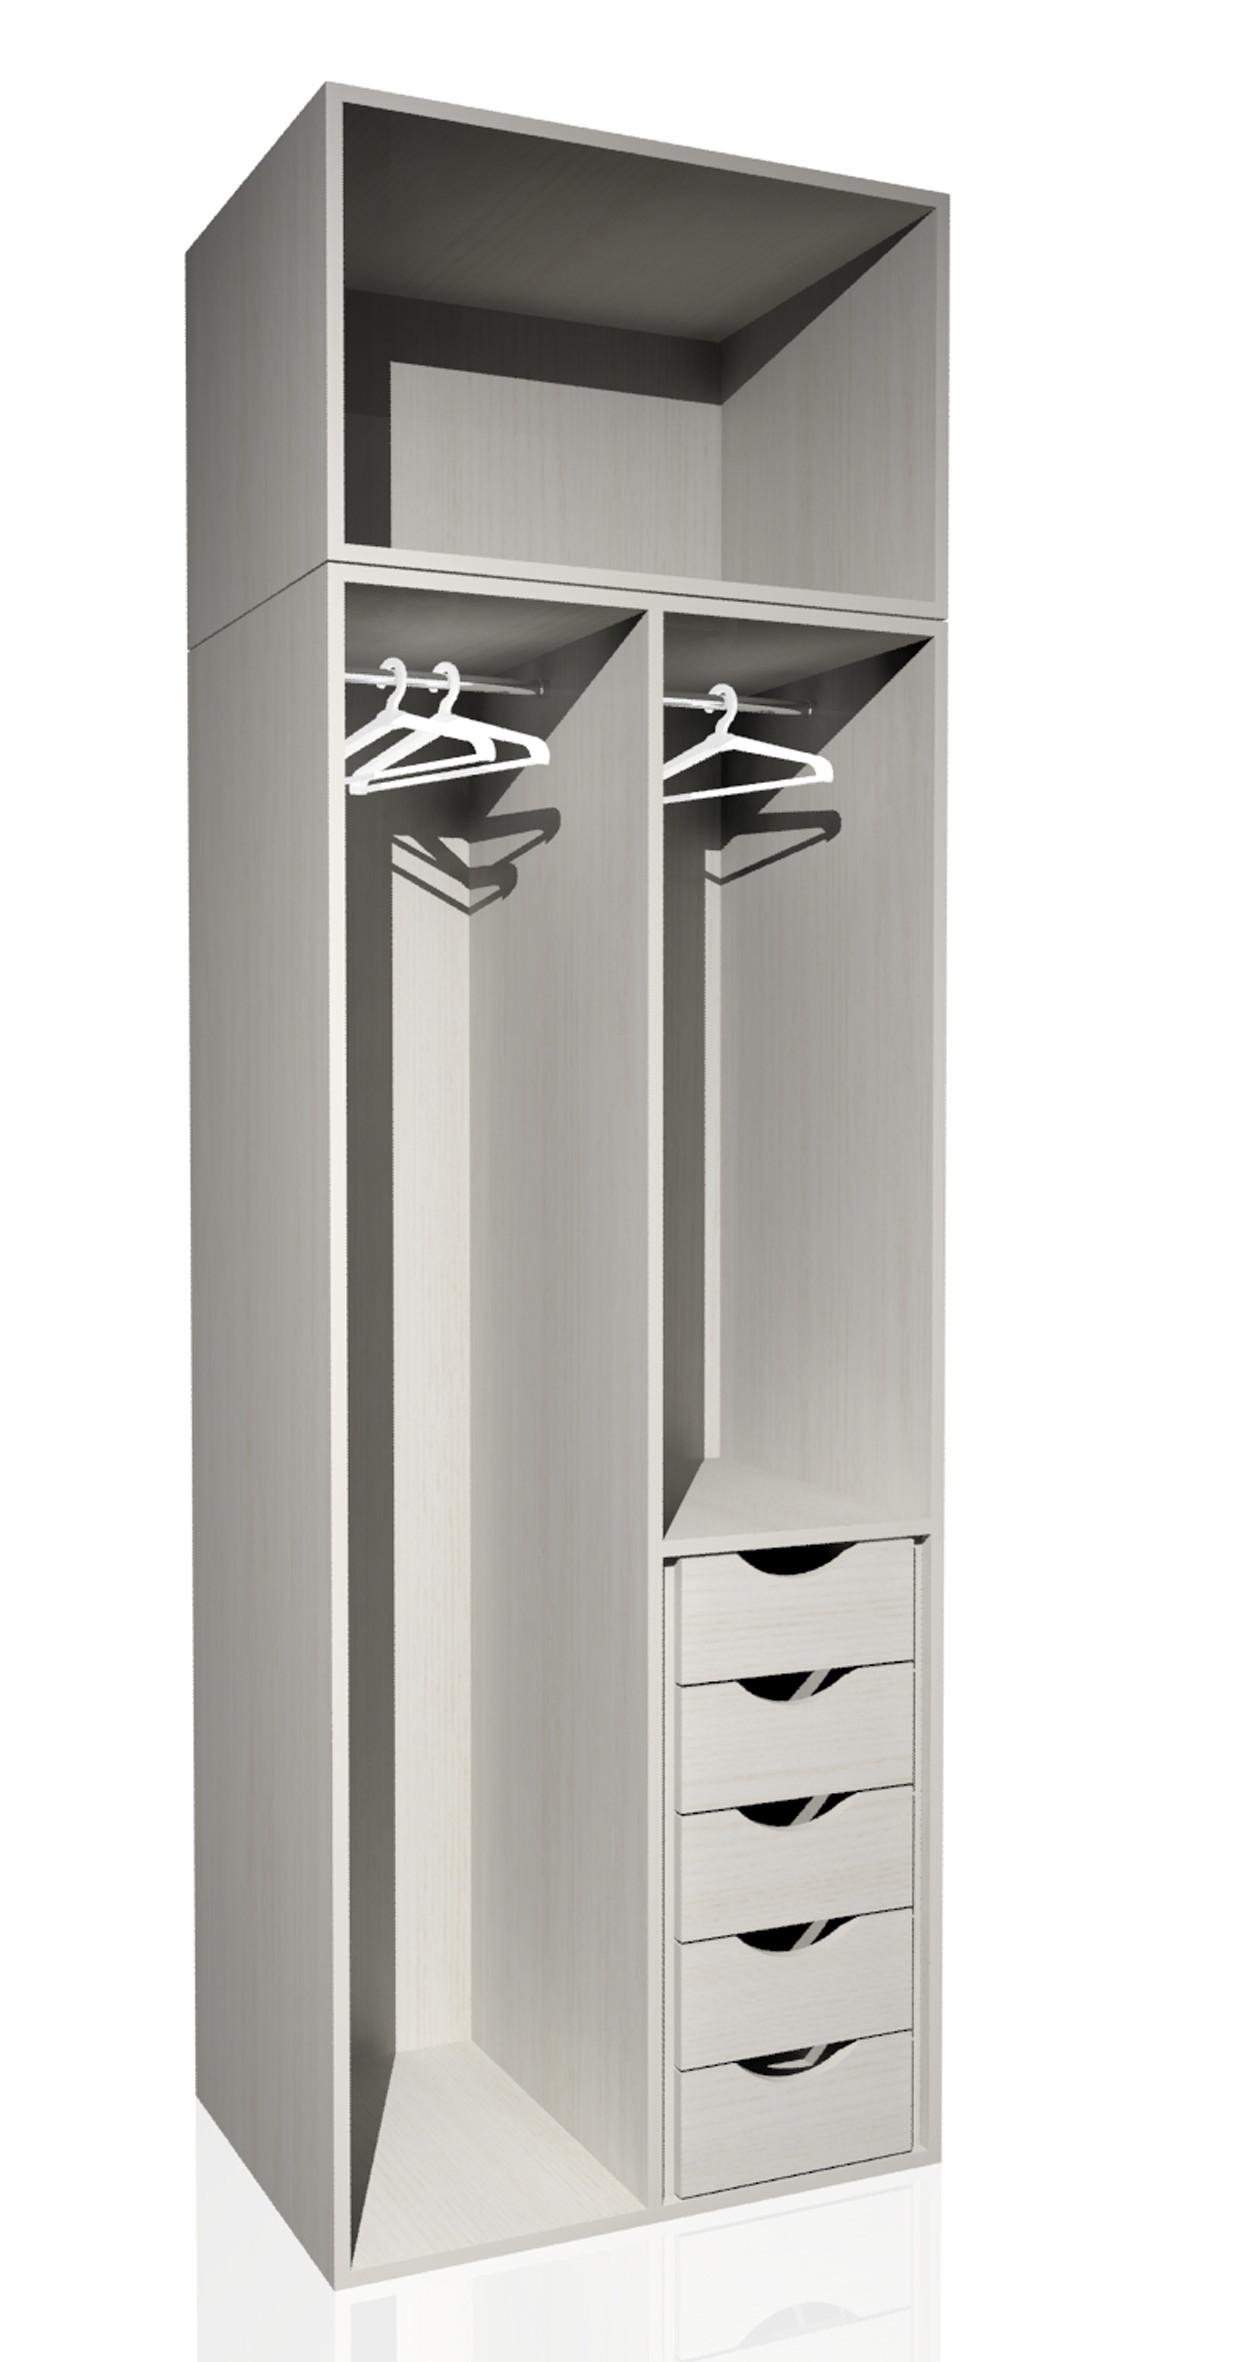 Adesivo De Geladeira Retro ~ Diseños Tecdema u2013 Armarios Módulos